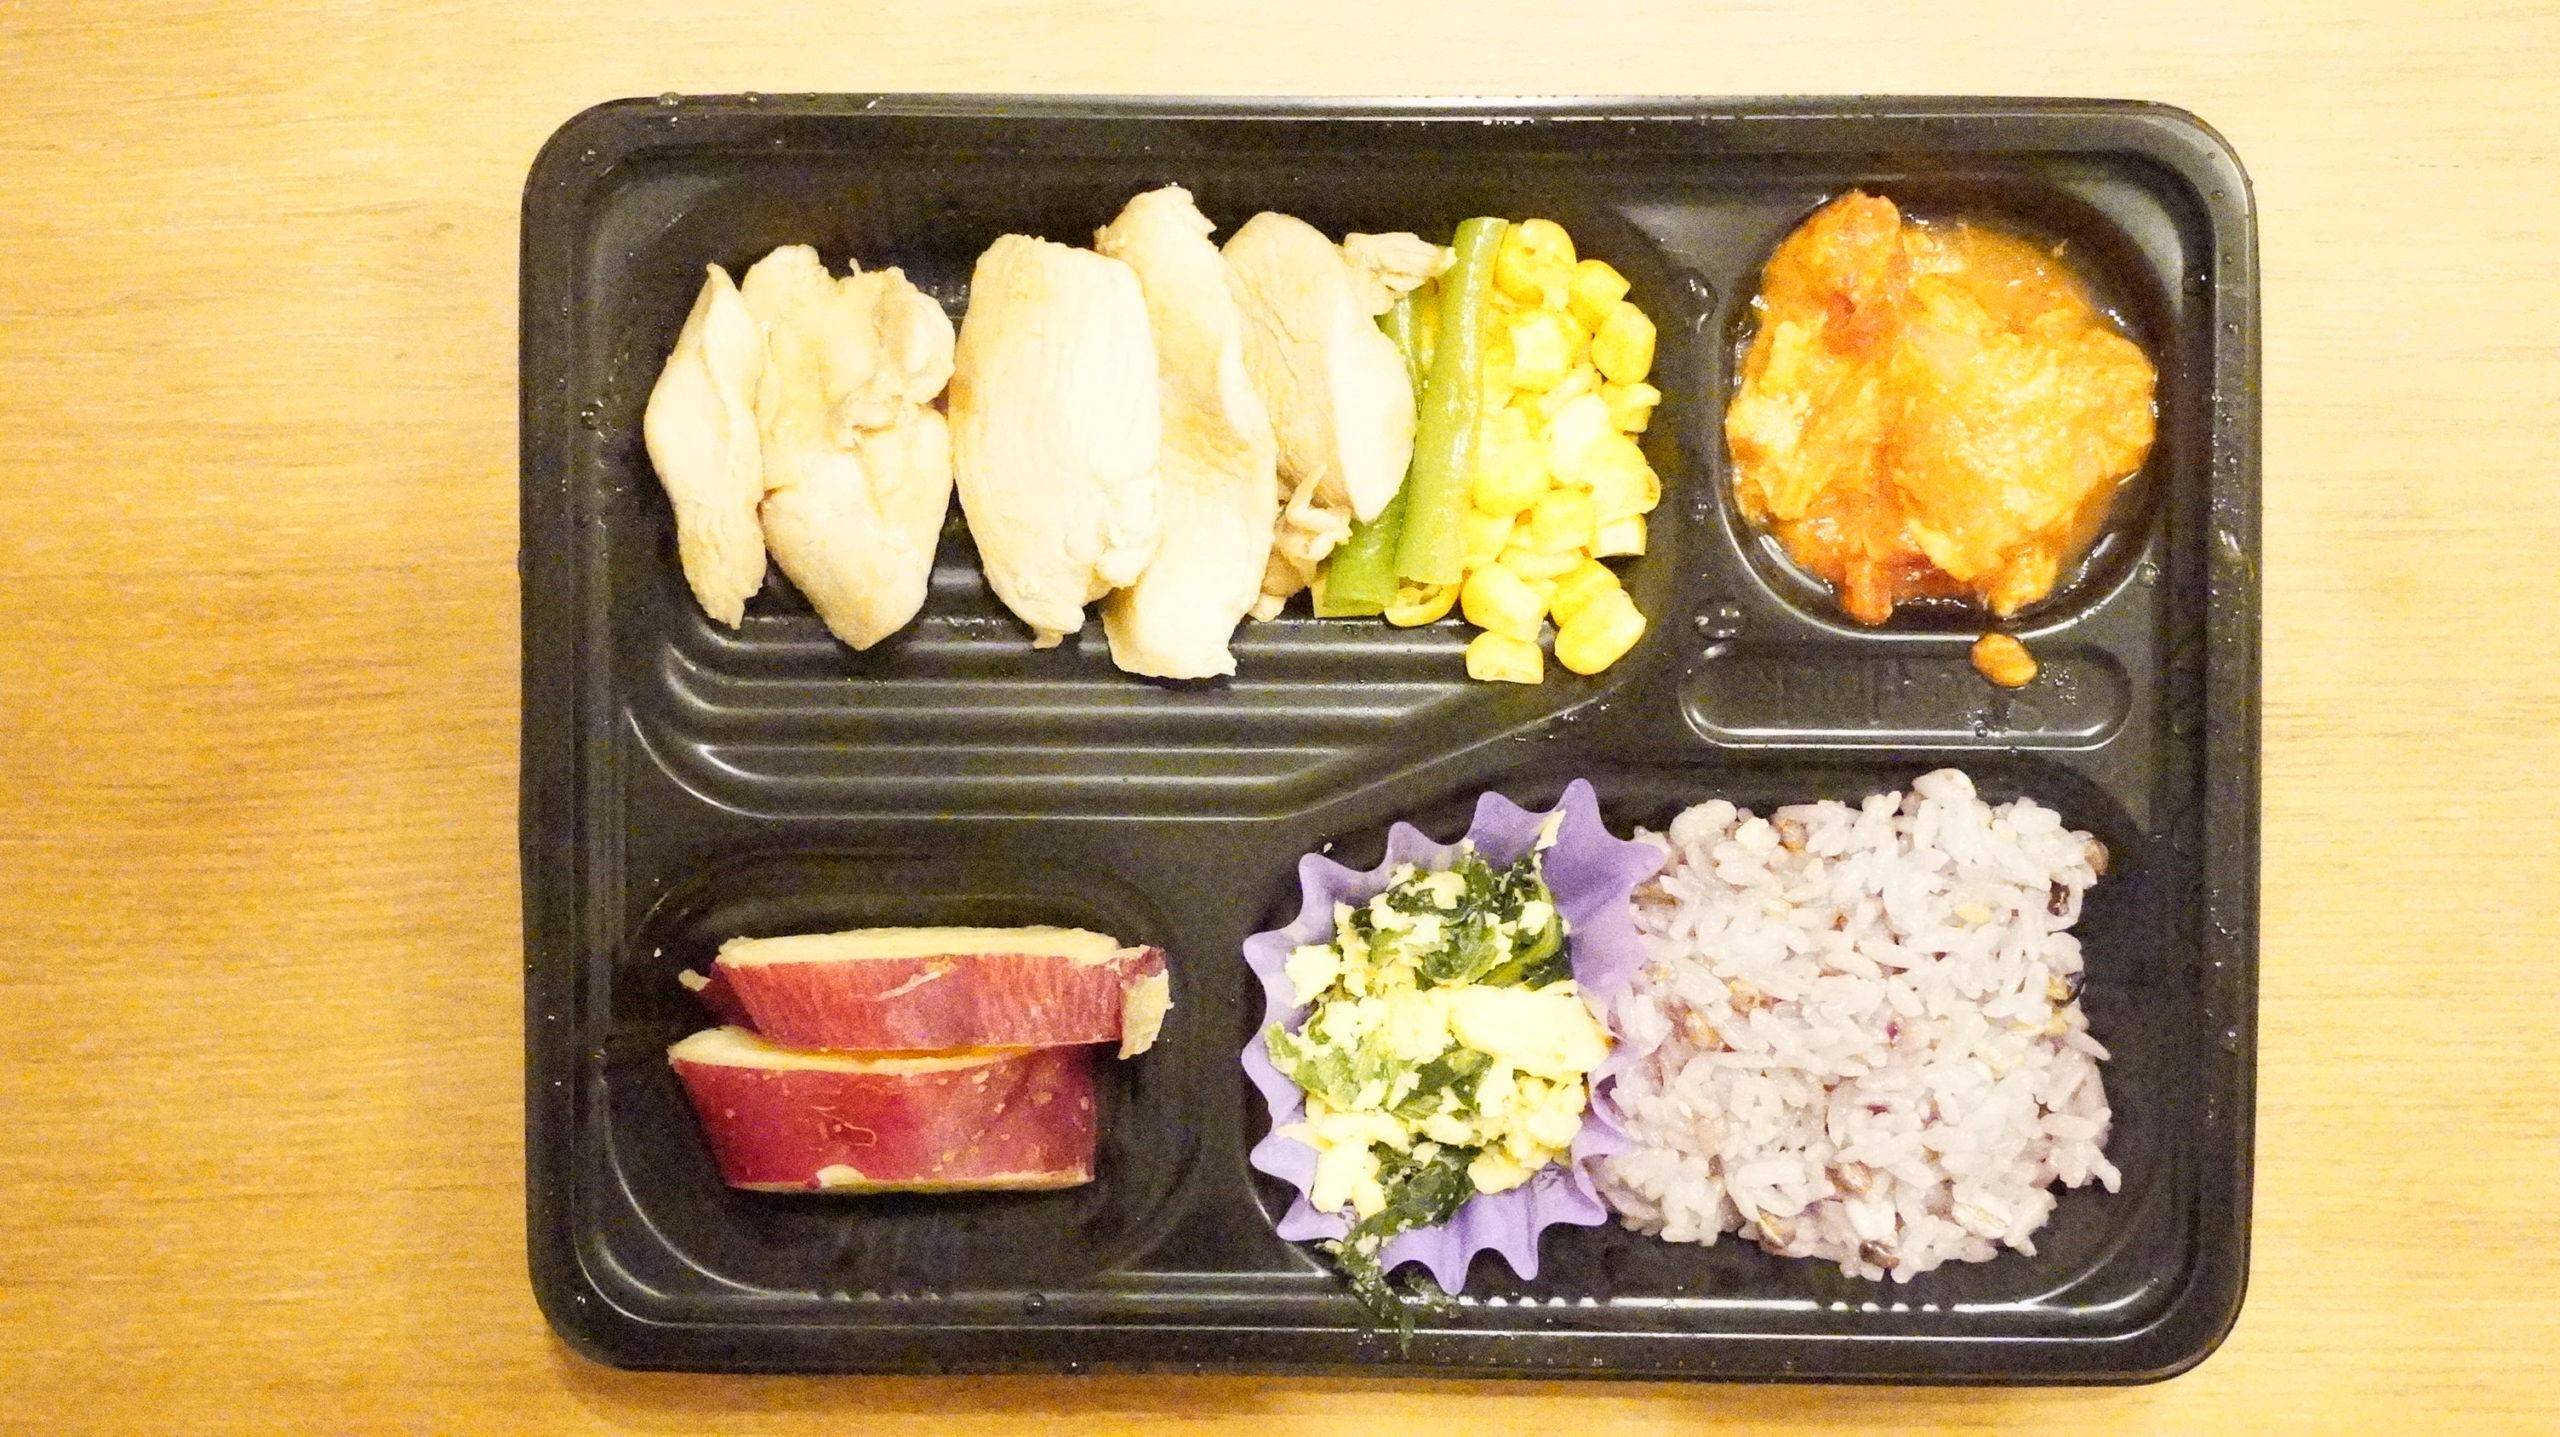 More than Deli(モアザンデリ)の冷凍弁当「鶏肉のいため煮」を上から撮影した写真